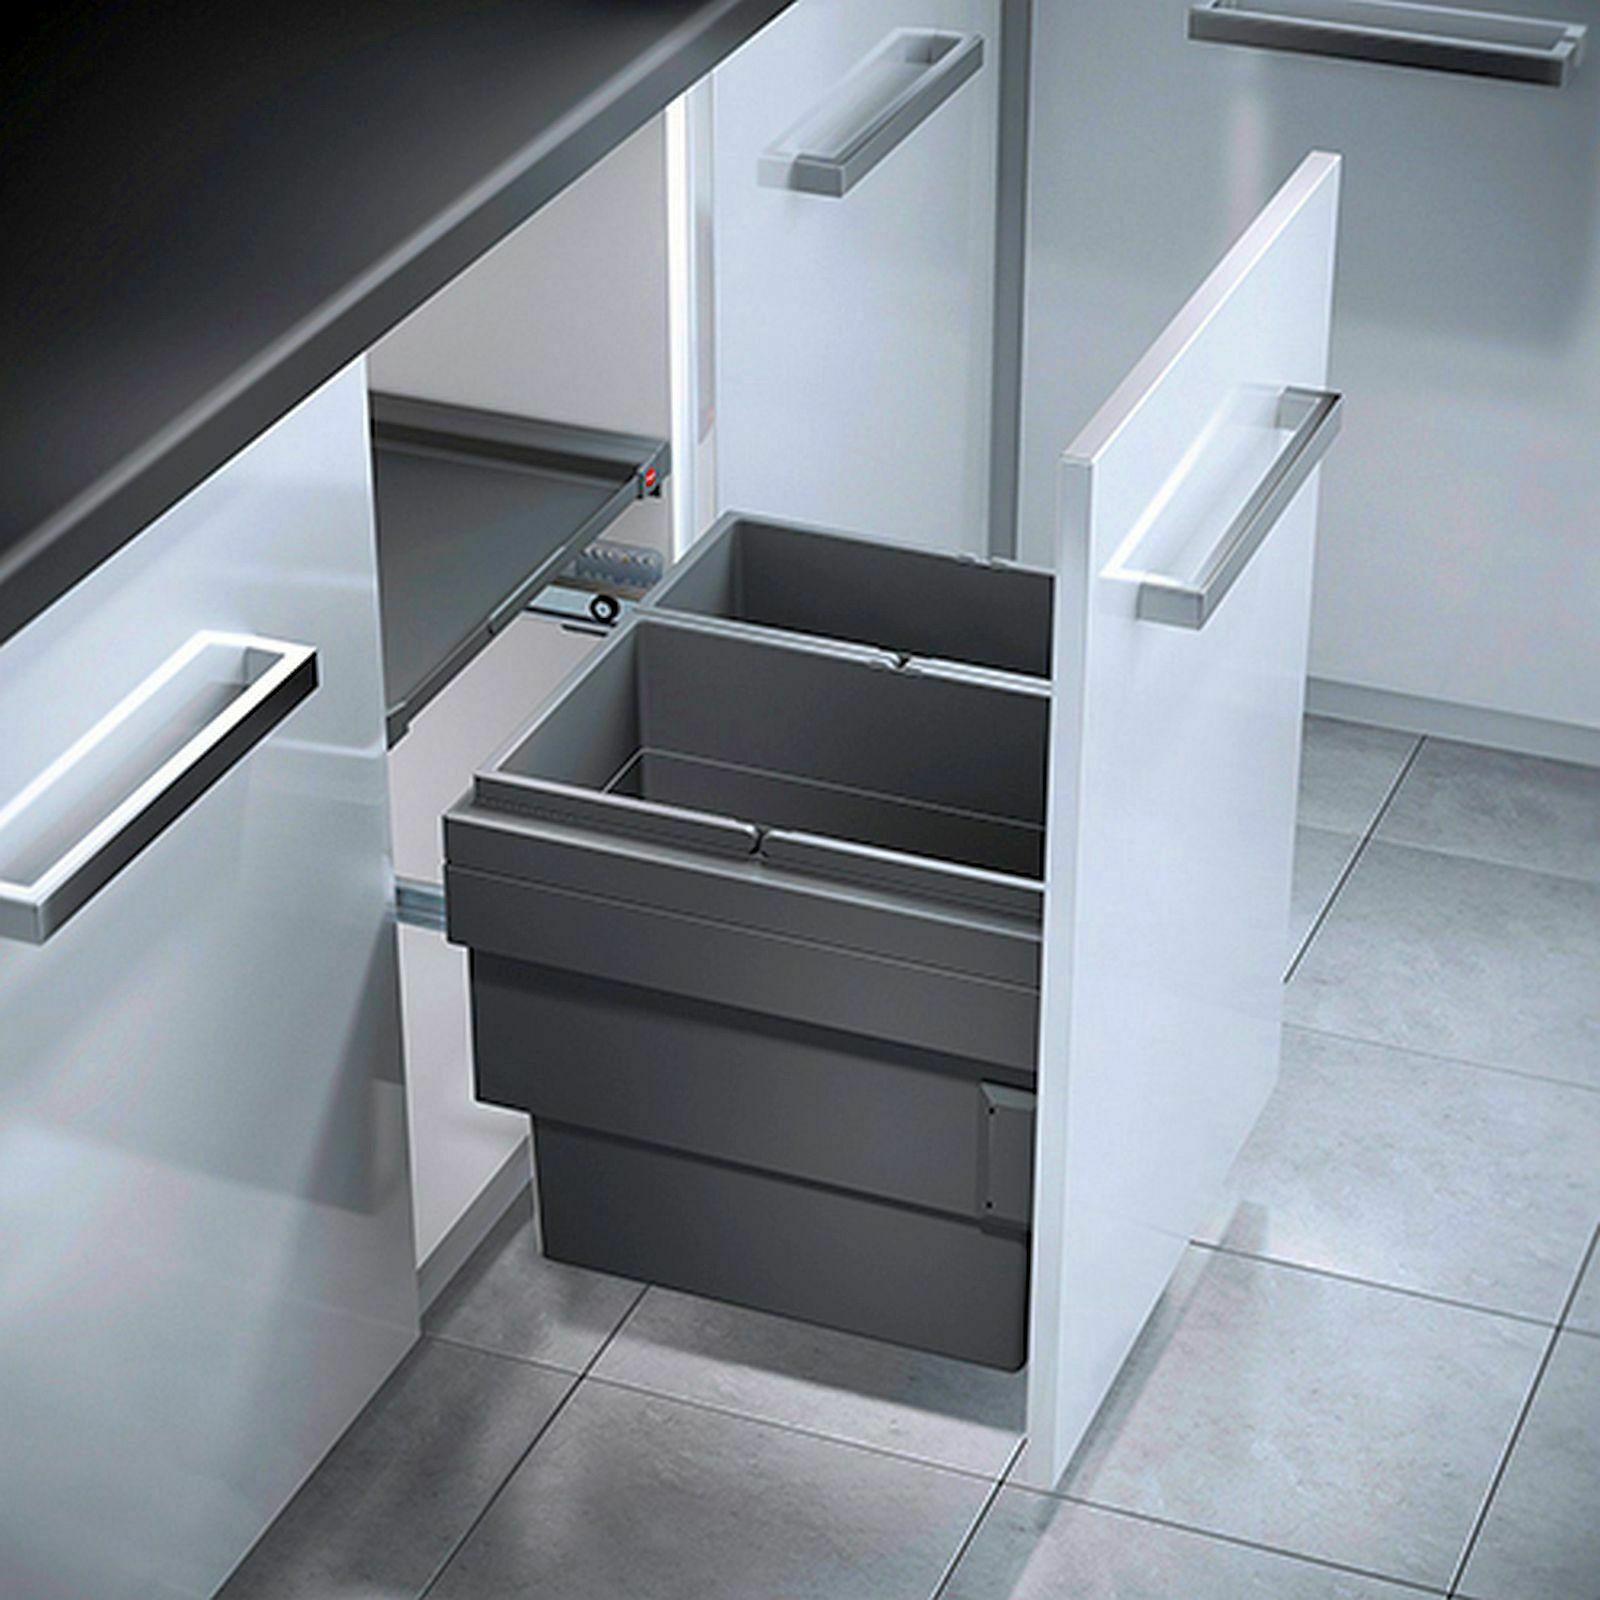 Full Size of 5e2706e183c34 Müllsystem Küche Wohnzimmer Müllsystem